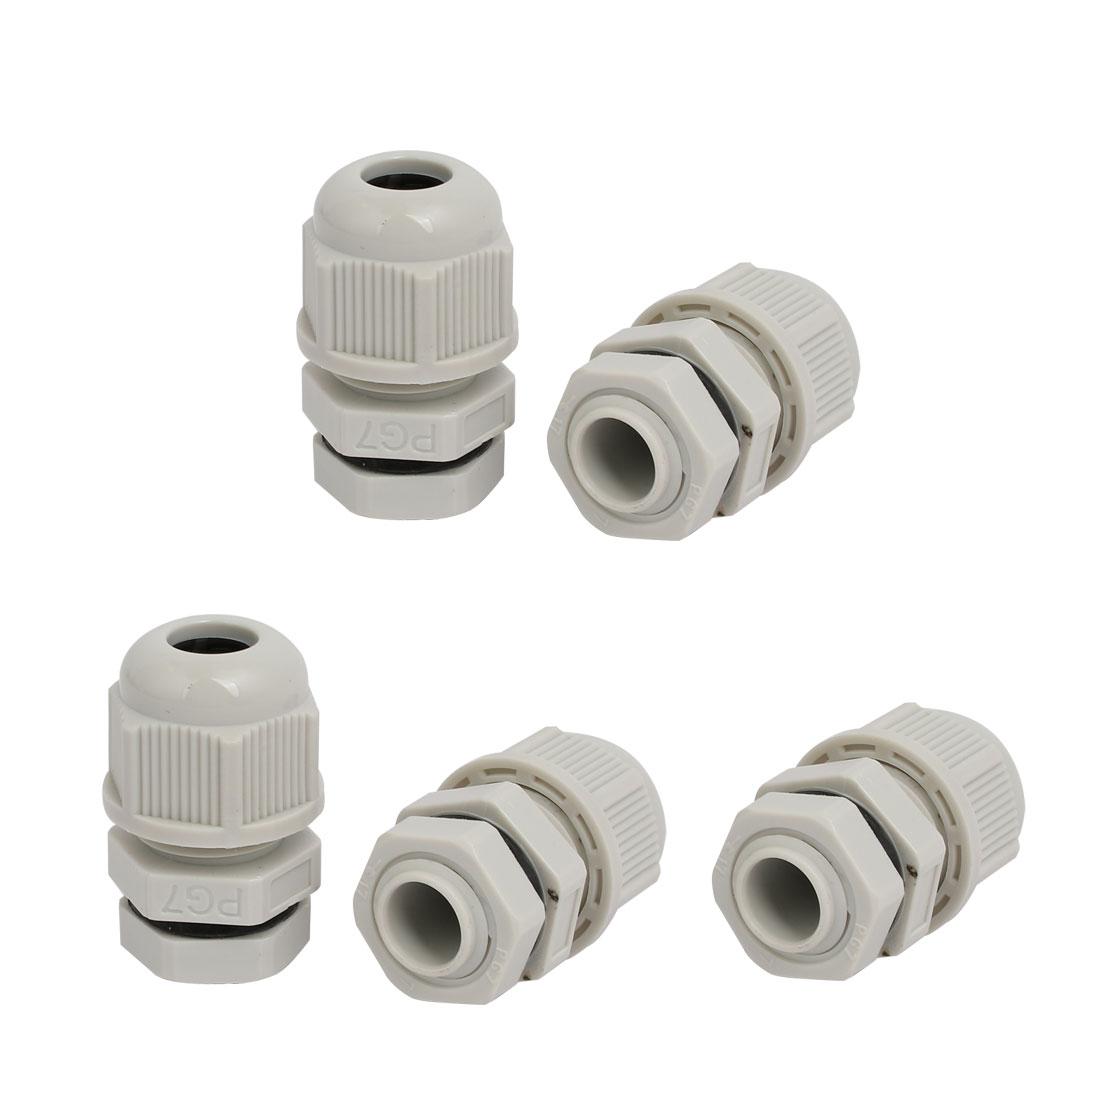 PG7 1.6mm-2.6mm Range Nylon 3 Holes Adjustable Cables Gland Connector Gray 5pcs